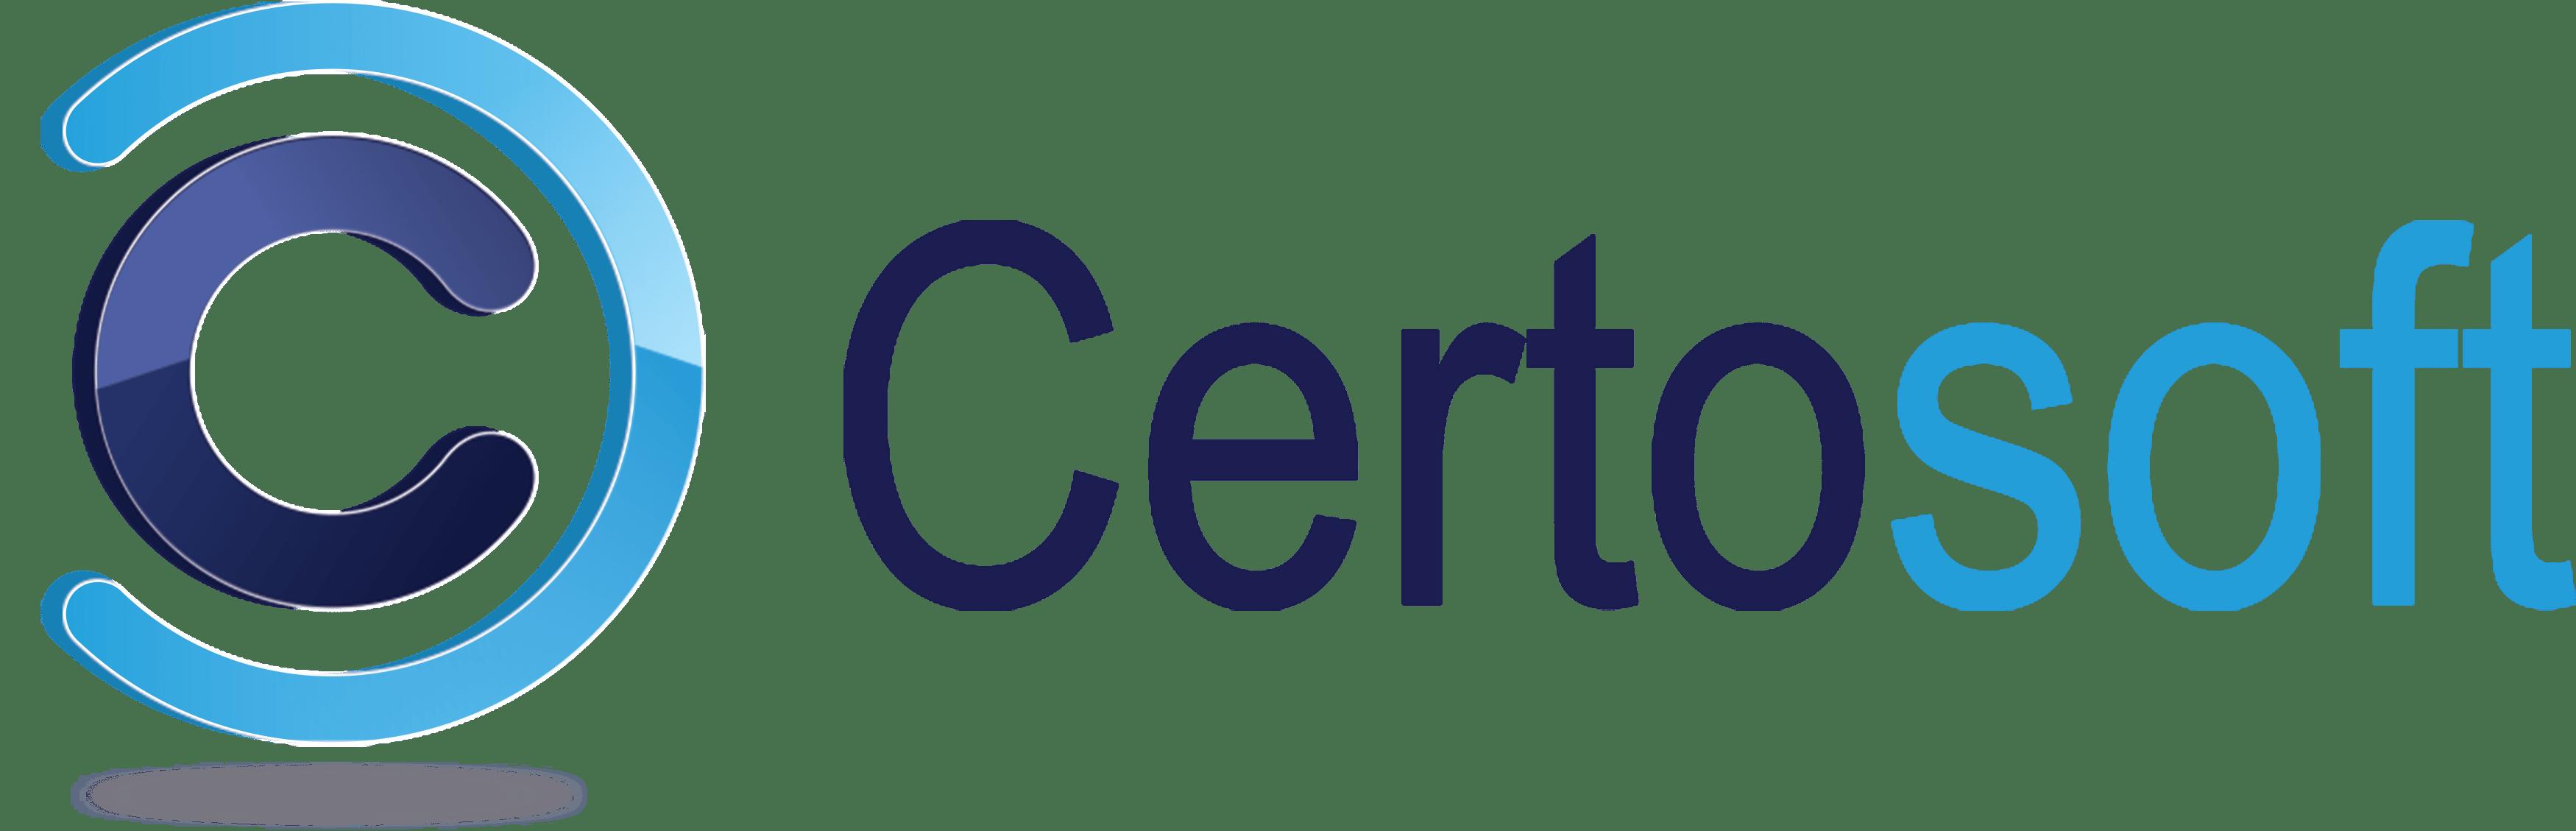 Certosoft